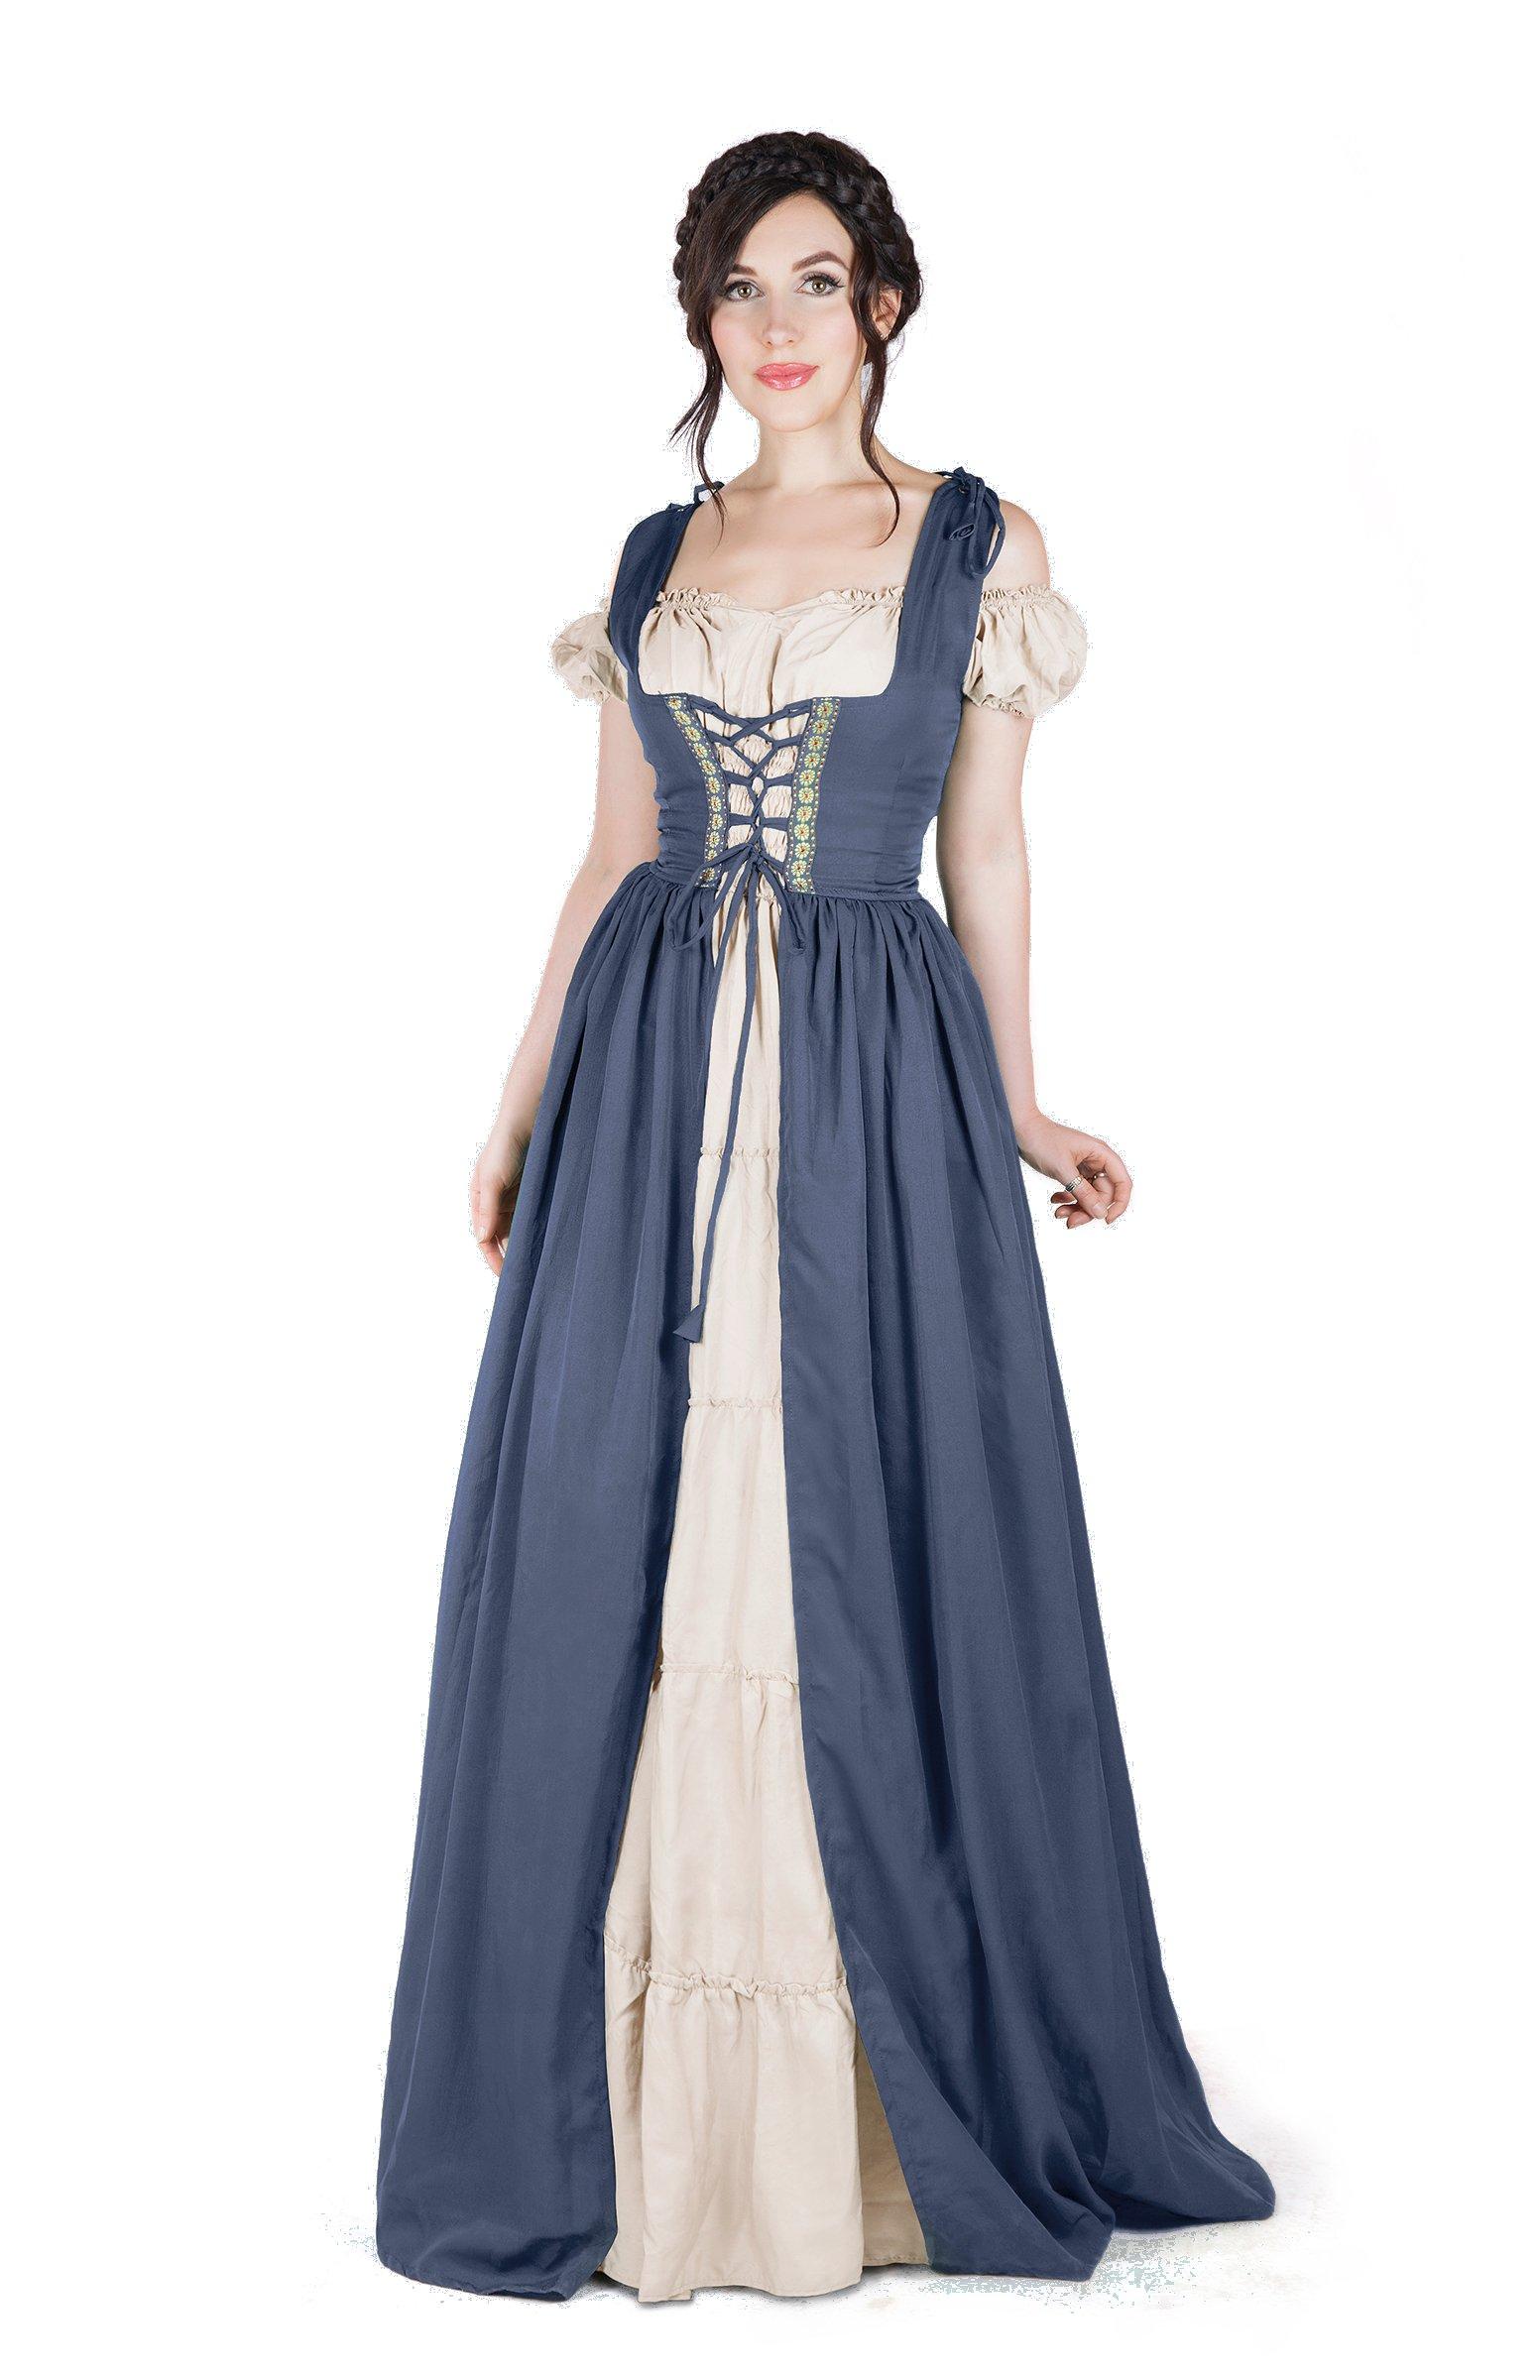 Renaissance Medieval Irish Costume Over Dress & Boho Chemise Set (S/M, Charcoal)